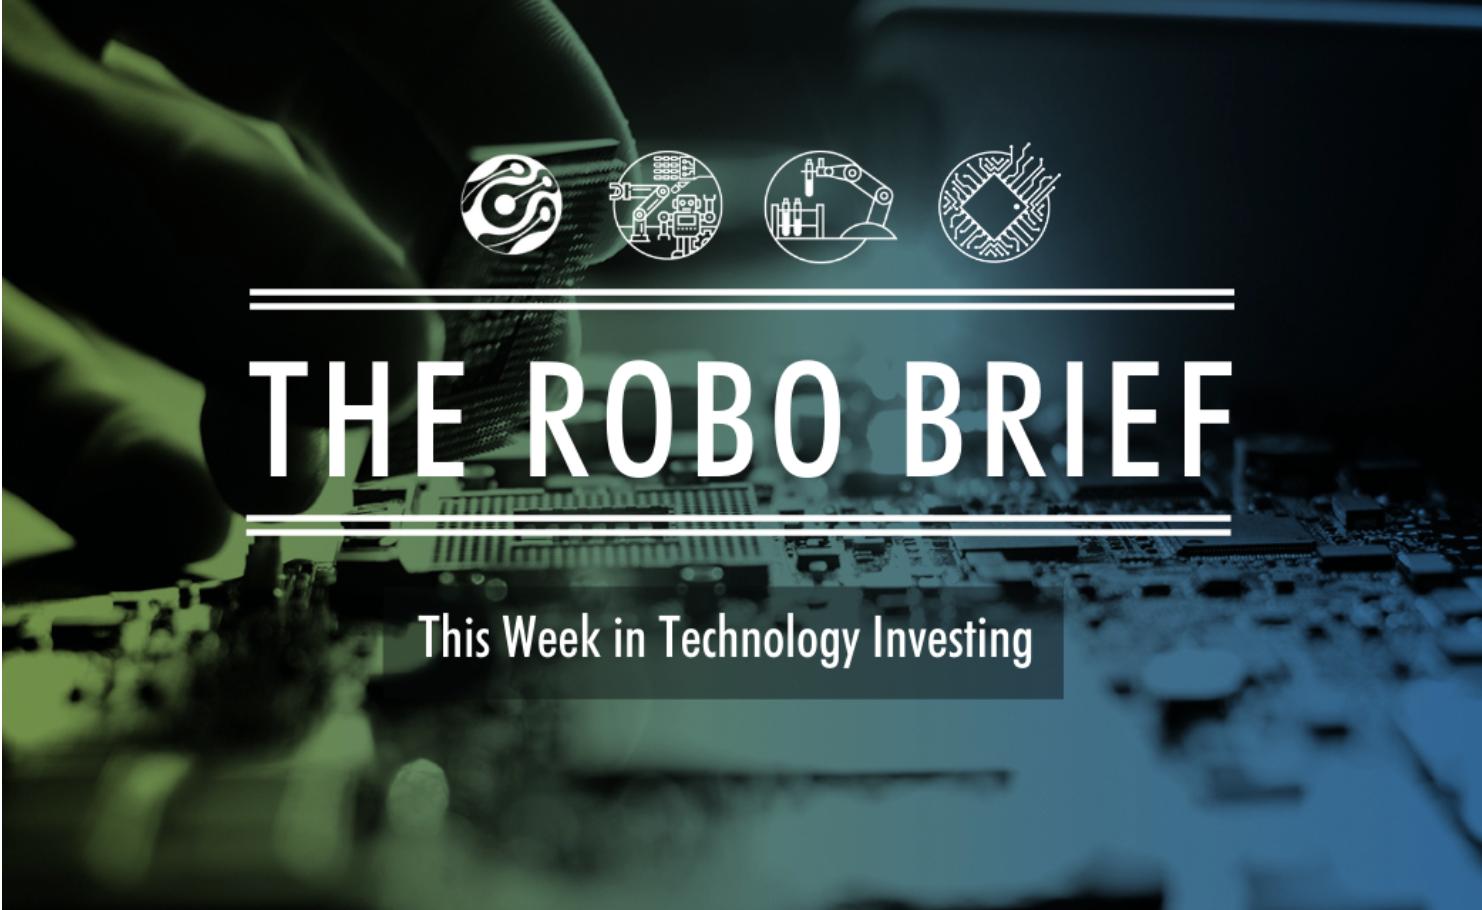 ROBO Brief: E-commerce Growth in China, A New Healthcare App & Prenatal Testing News